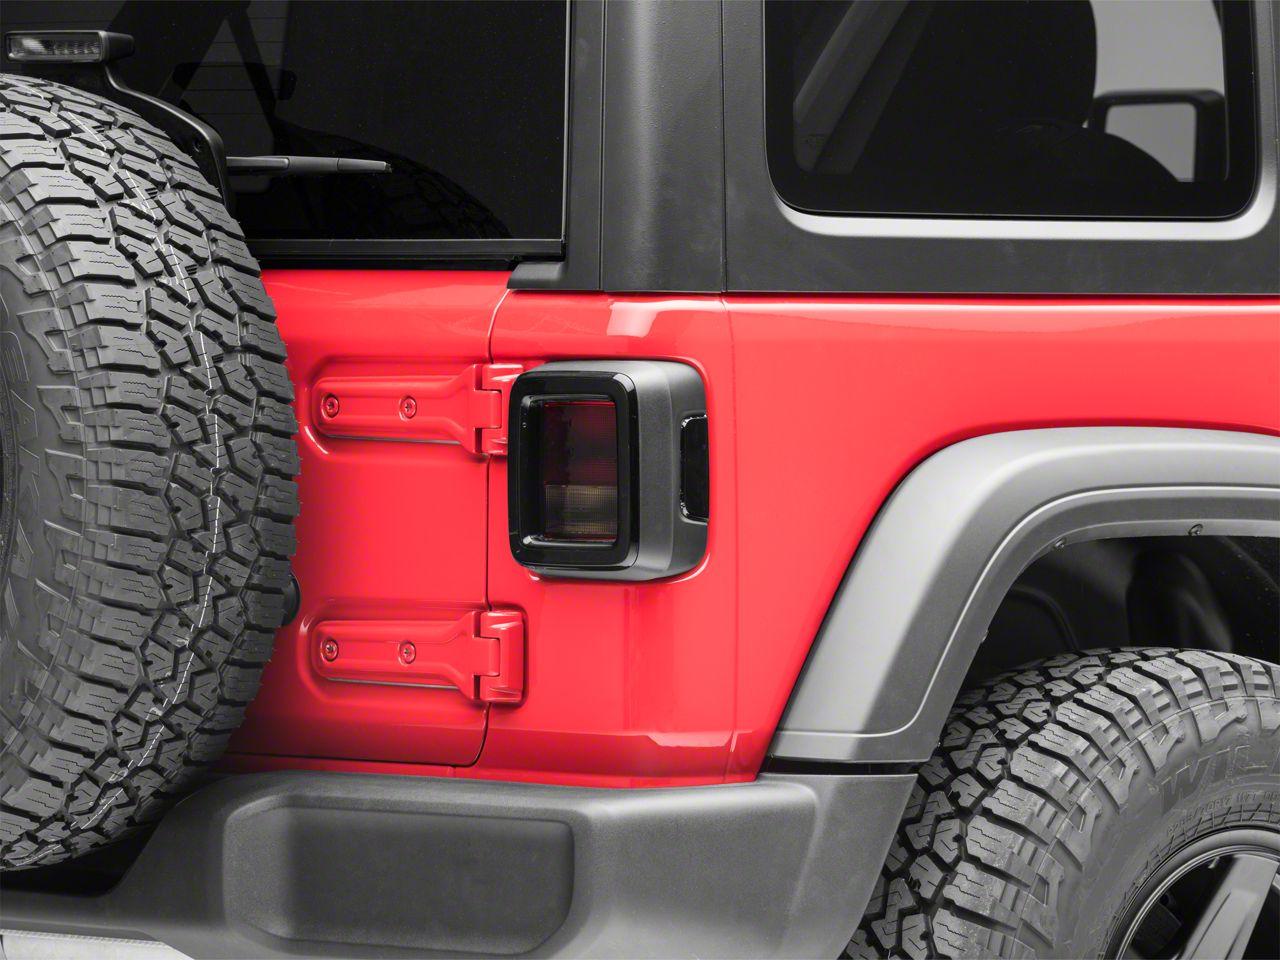 Smoked Tail Light Tint (18-19 Jeep Wrangler JL)